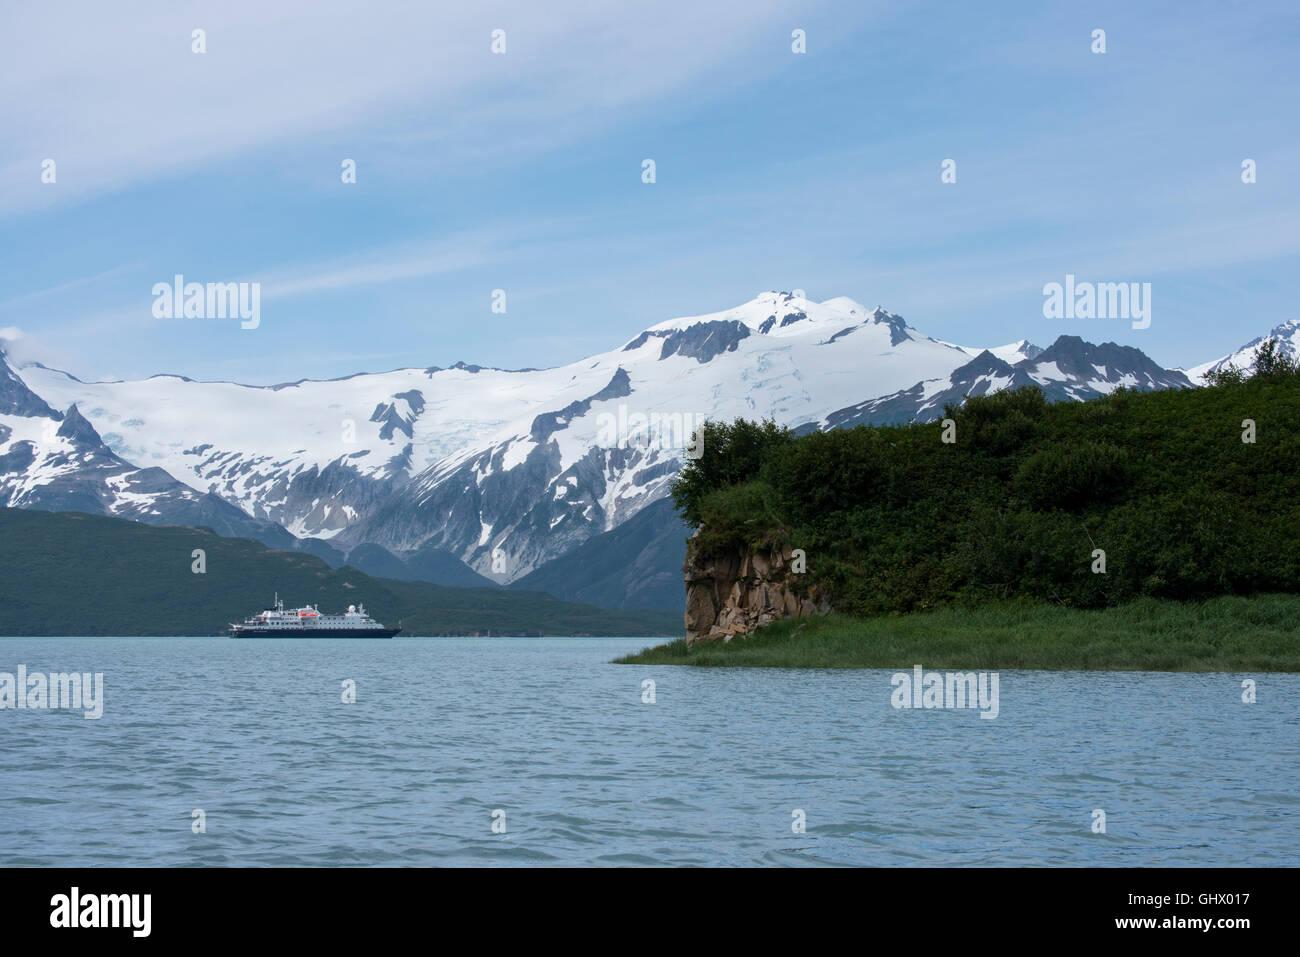 Alaska, Katmai National Park, Kukak Bay (50-16-68 N 154-17-55 W) Silversea expedition cruise ship, Silver Discoverer. - Stock Image